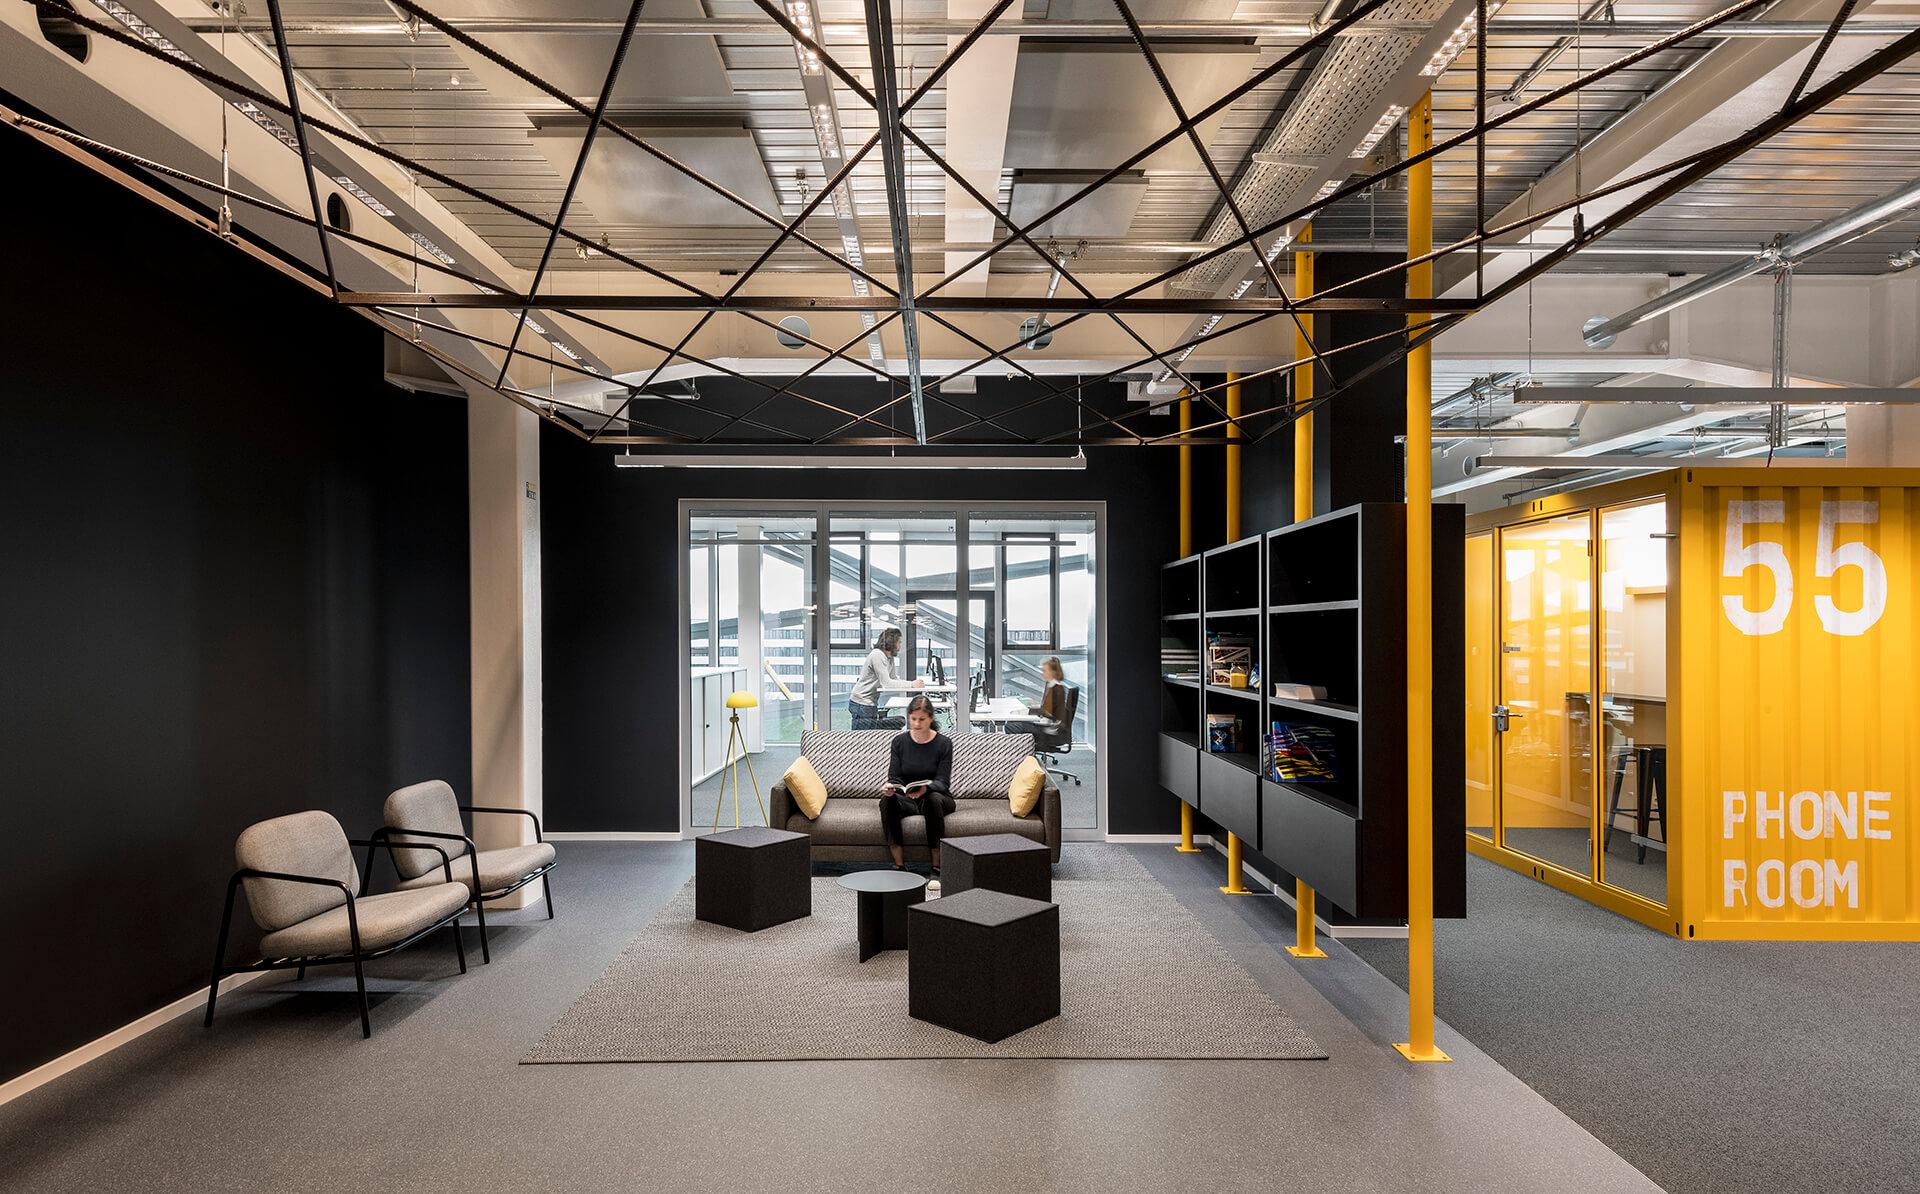 Adidas shows how interior design can